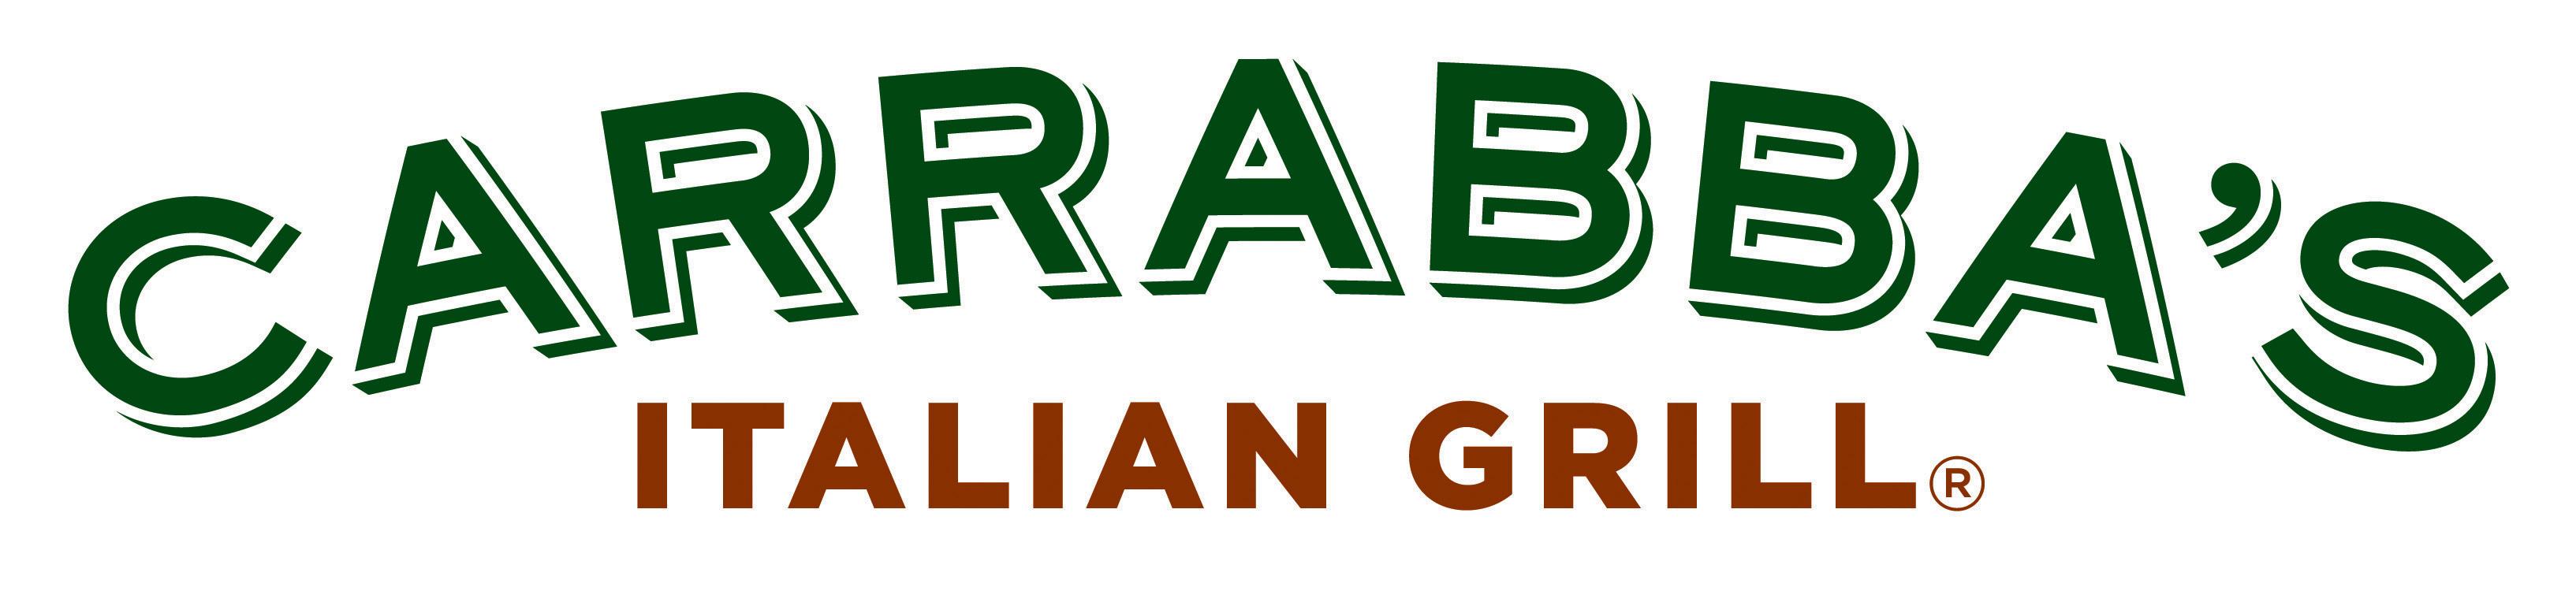 Carrabba's Italian Grill Logo